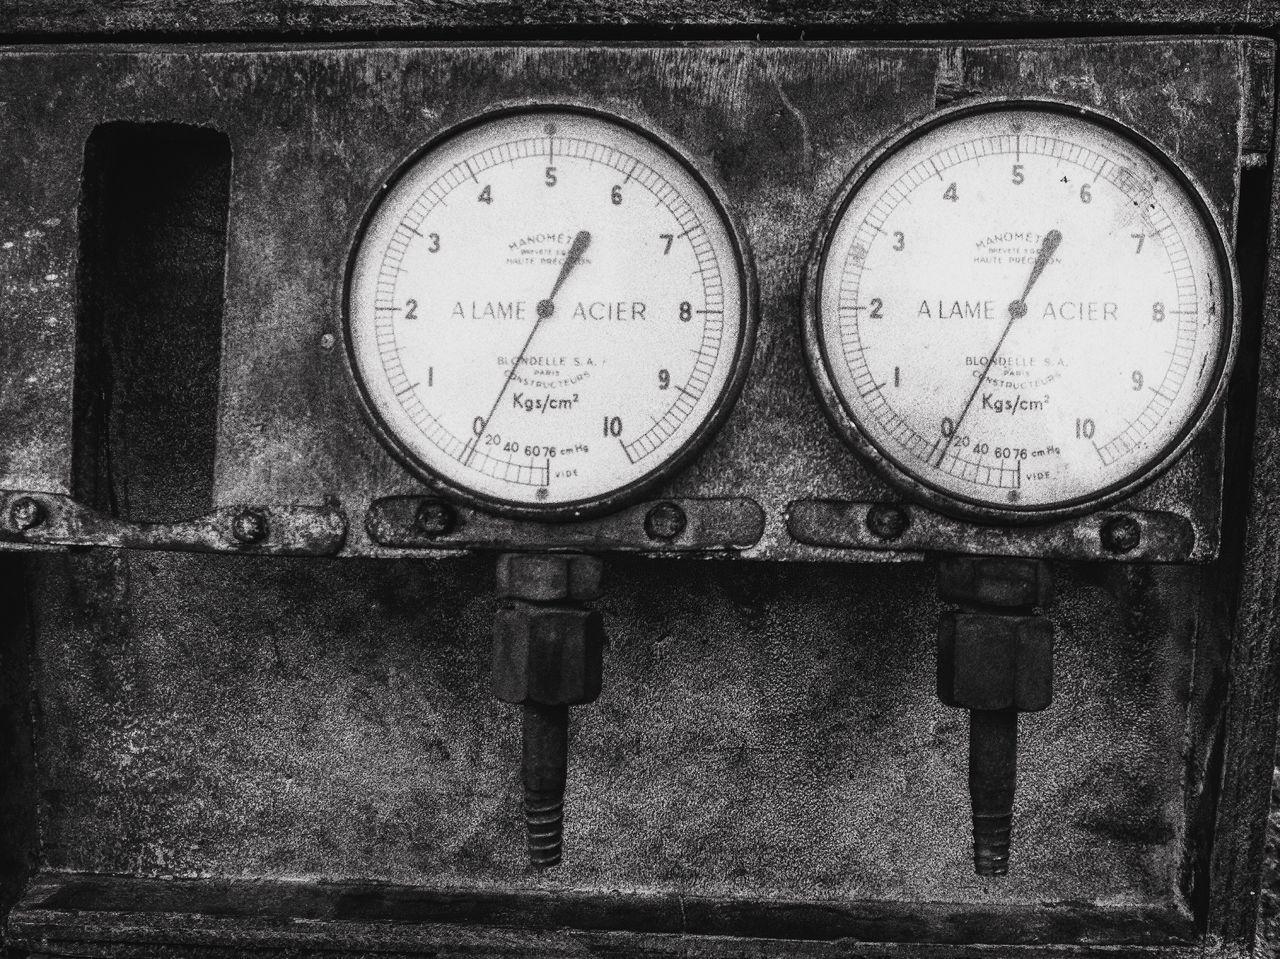 Cadrans usine Meter - Instrument Of Measurement Gauge Pressure Gauge No People Close-up Abandoned Technology Indoors  Day